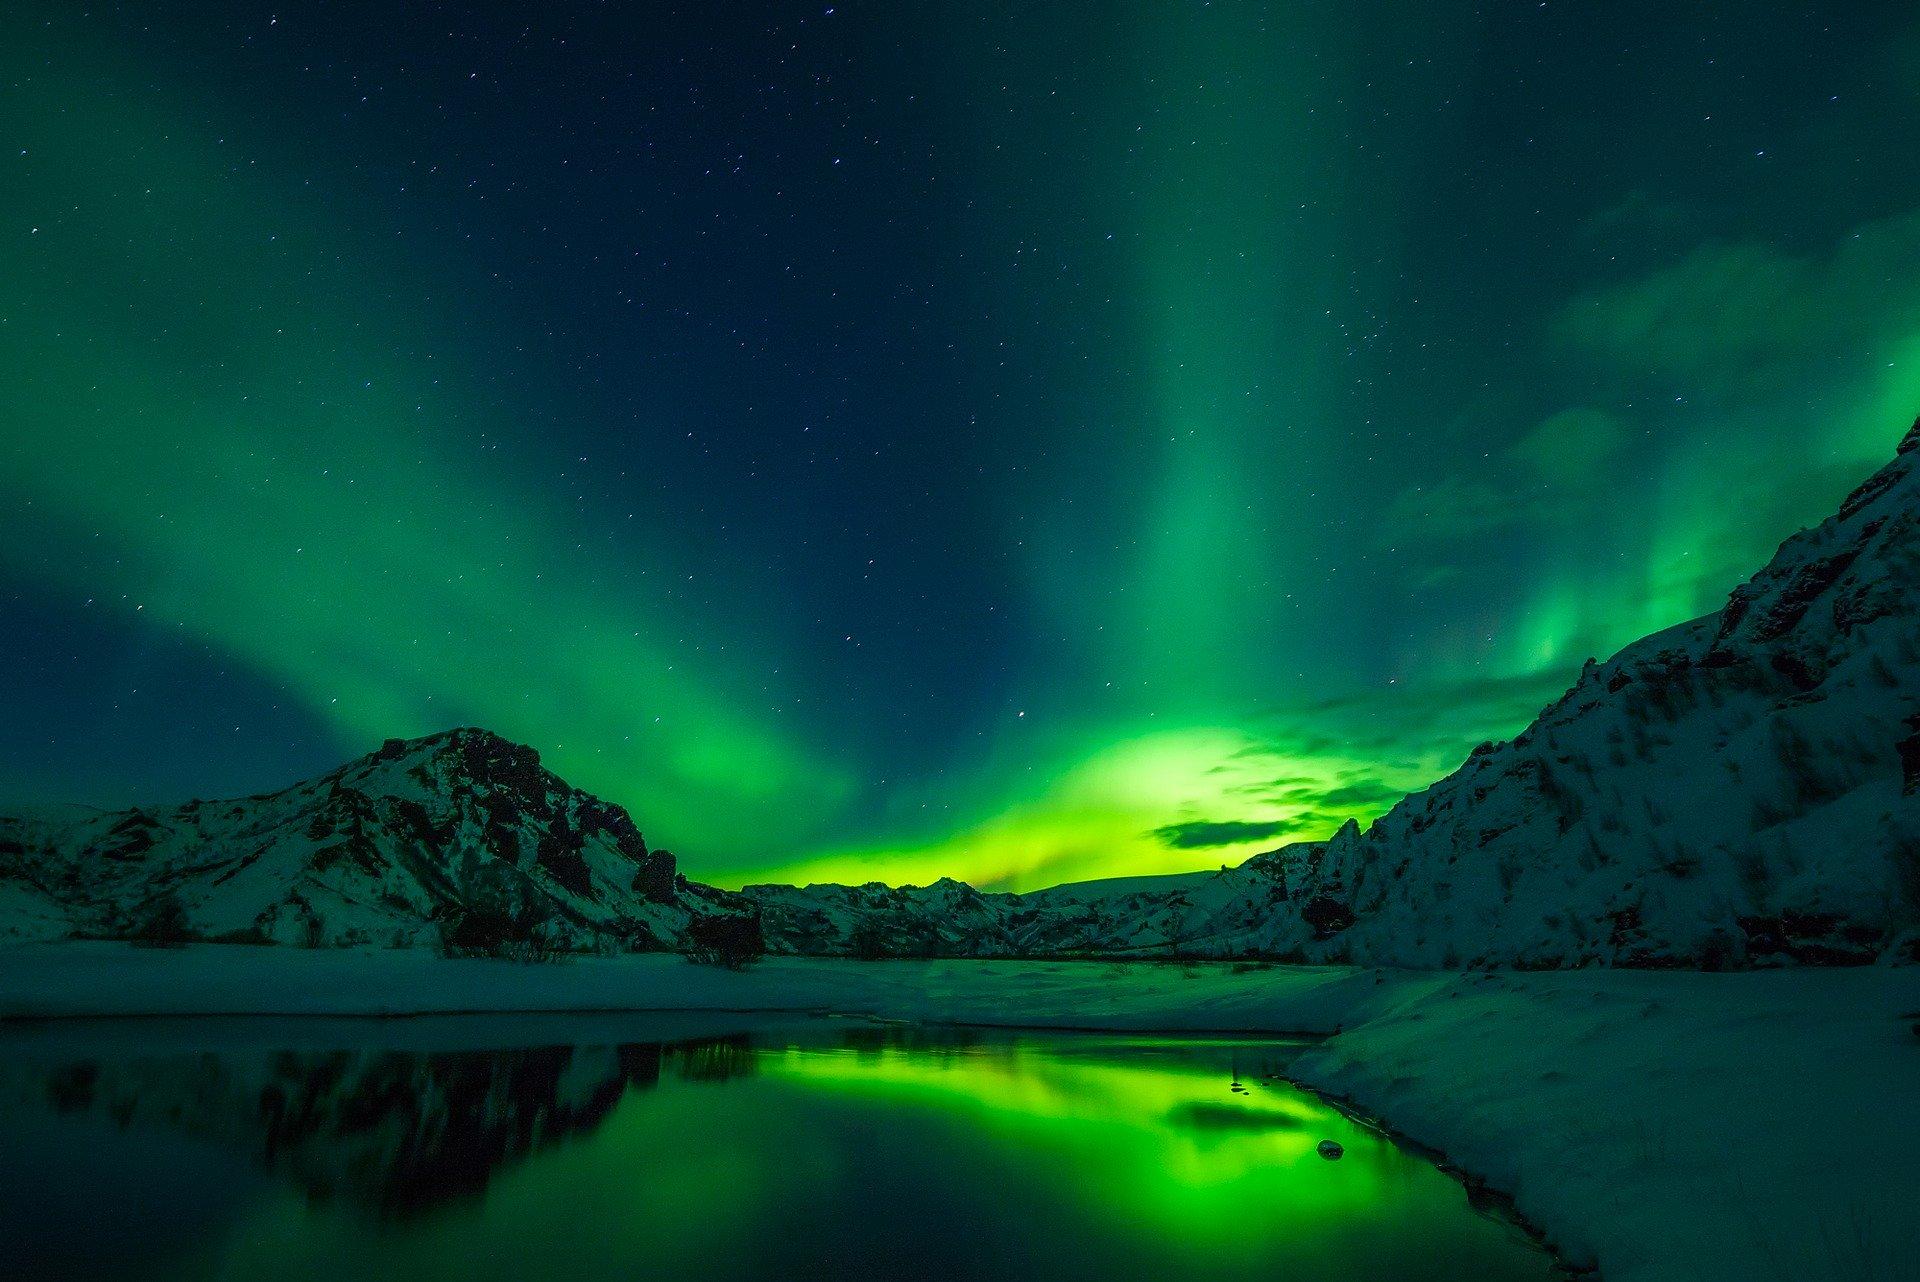 Package Iceland 8D5N เที่ยวด้วยตนเอง ไม่รวมตั๋วเครื่องบิน ราคาเริ่มต้น 77,600 บาท เหมาะสำหรับผู้ที่ใช้ภาษาอังกฤษได้เท่านั้น